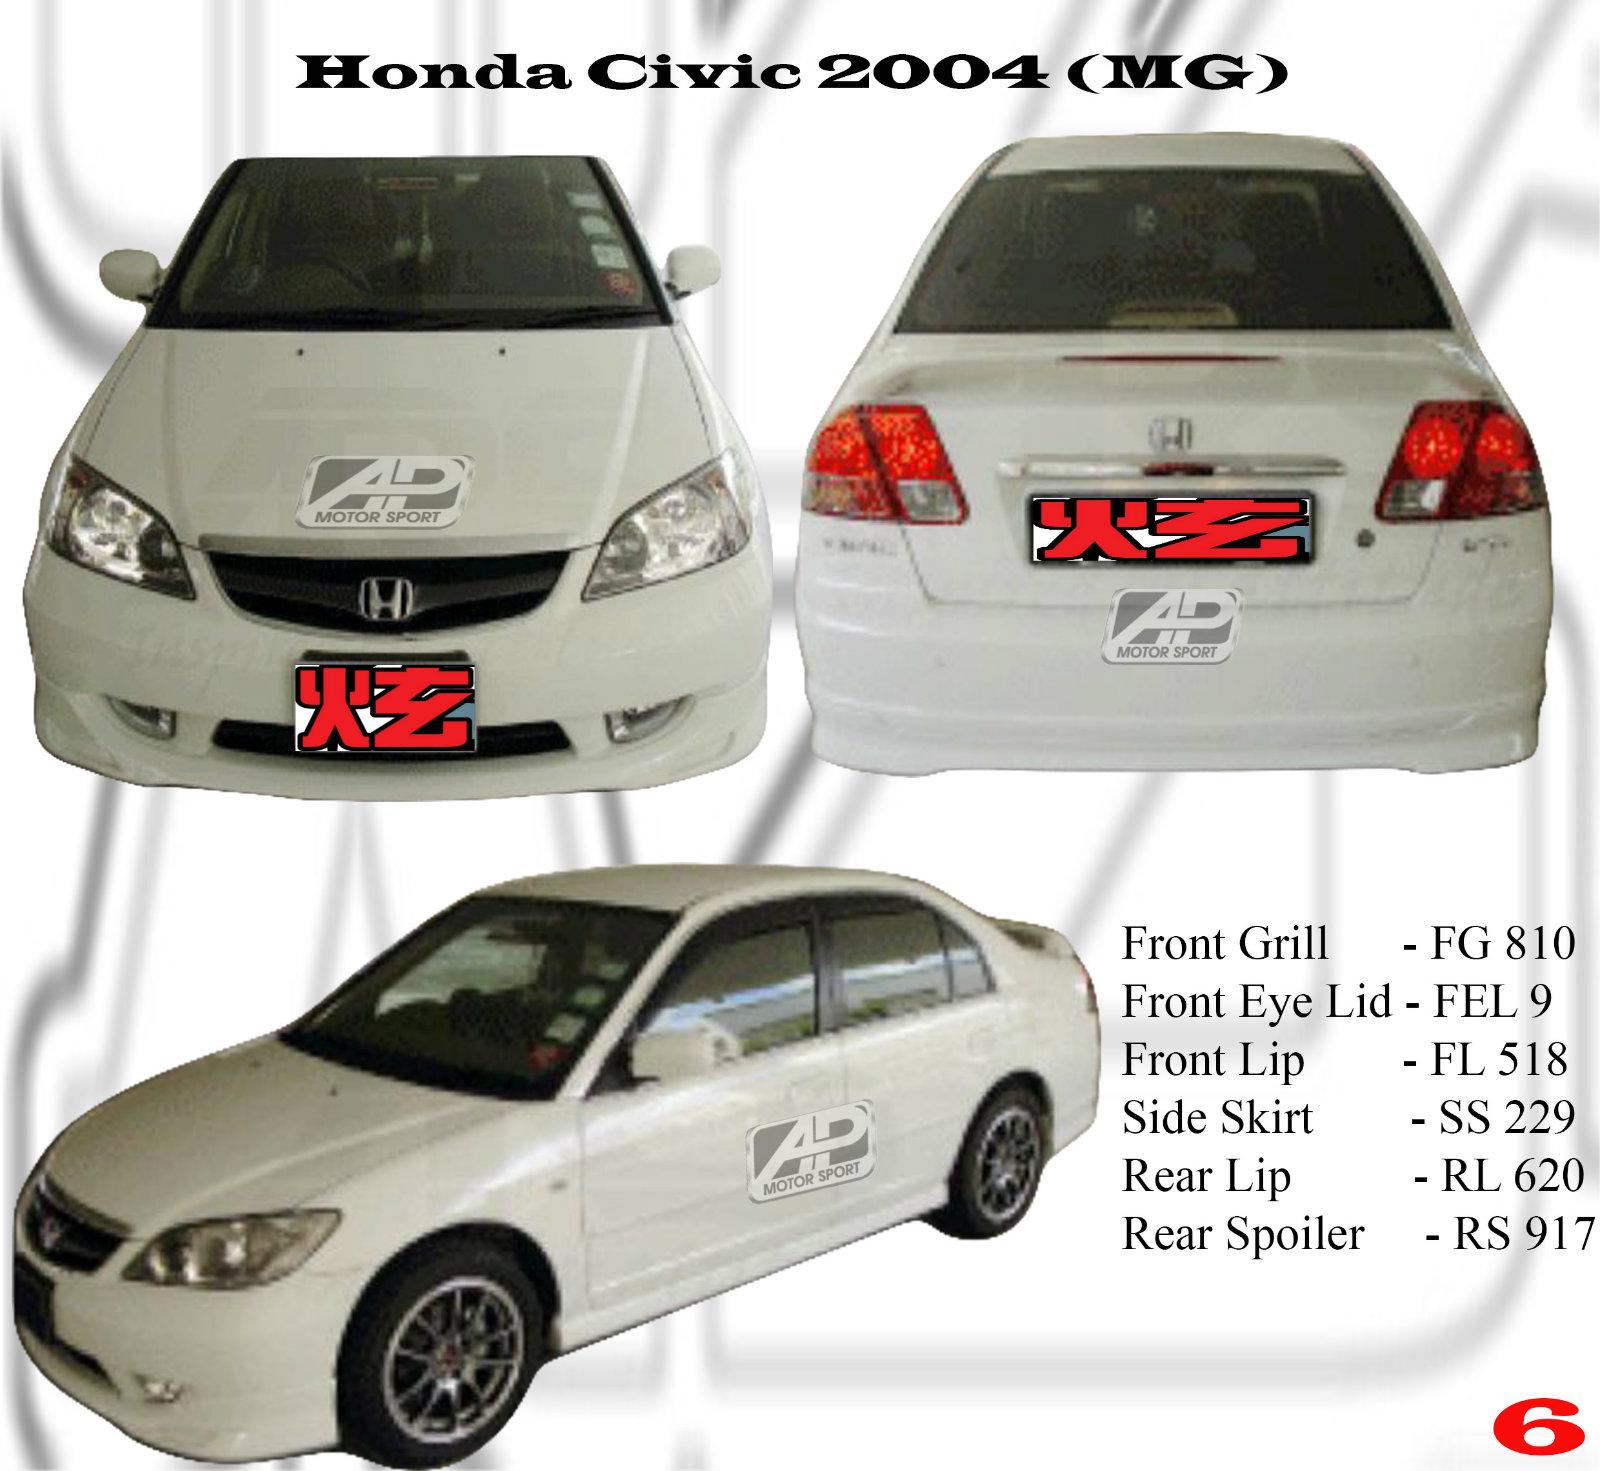 Honda Civic 2005 Mg Bodykits Honda Civic 2005 Johor Bahru Jb Malaysia Body Kits A Perfect Motor Sport